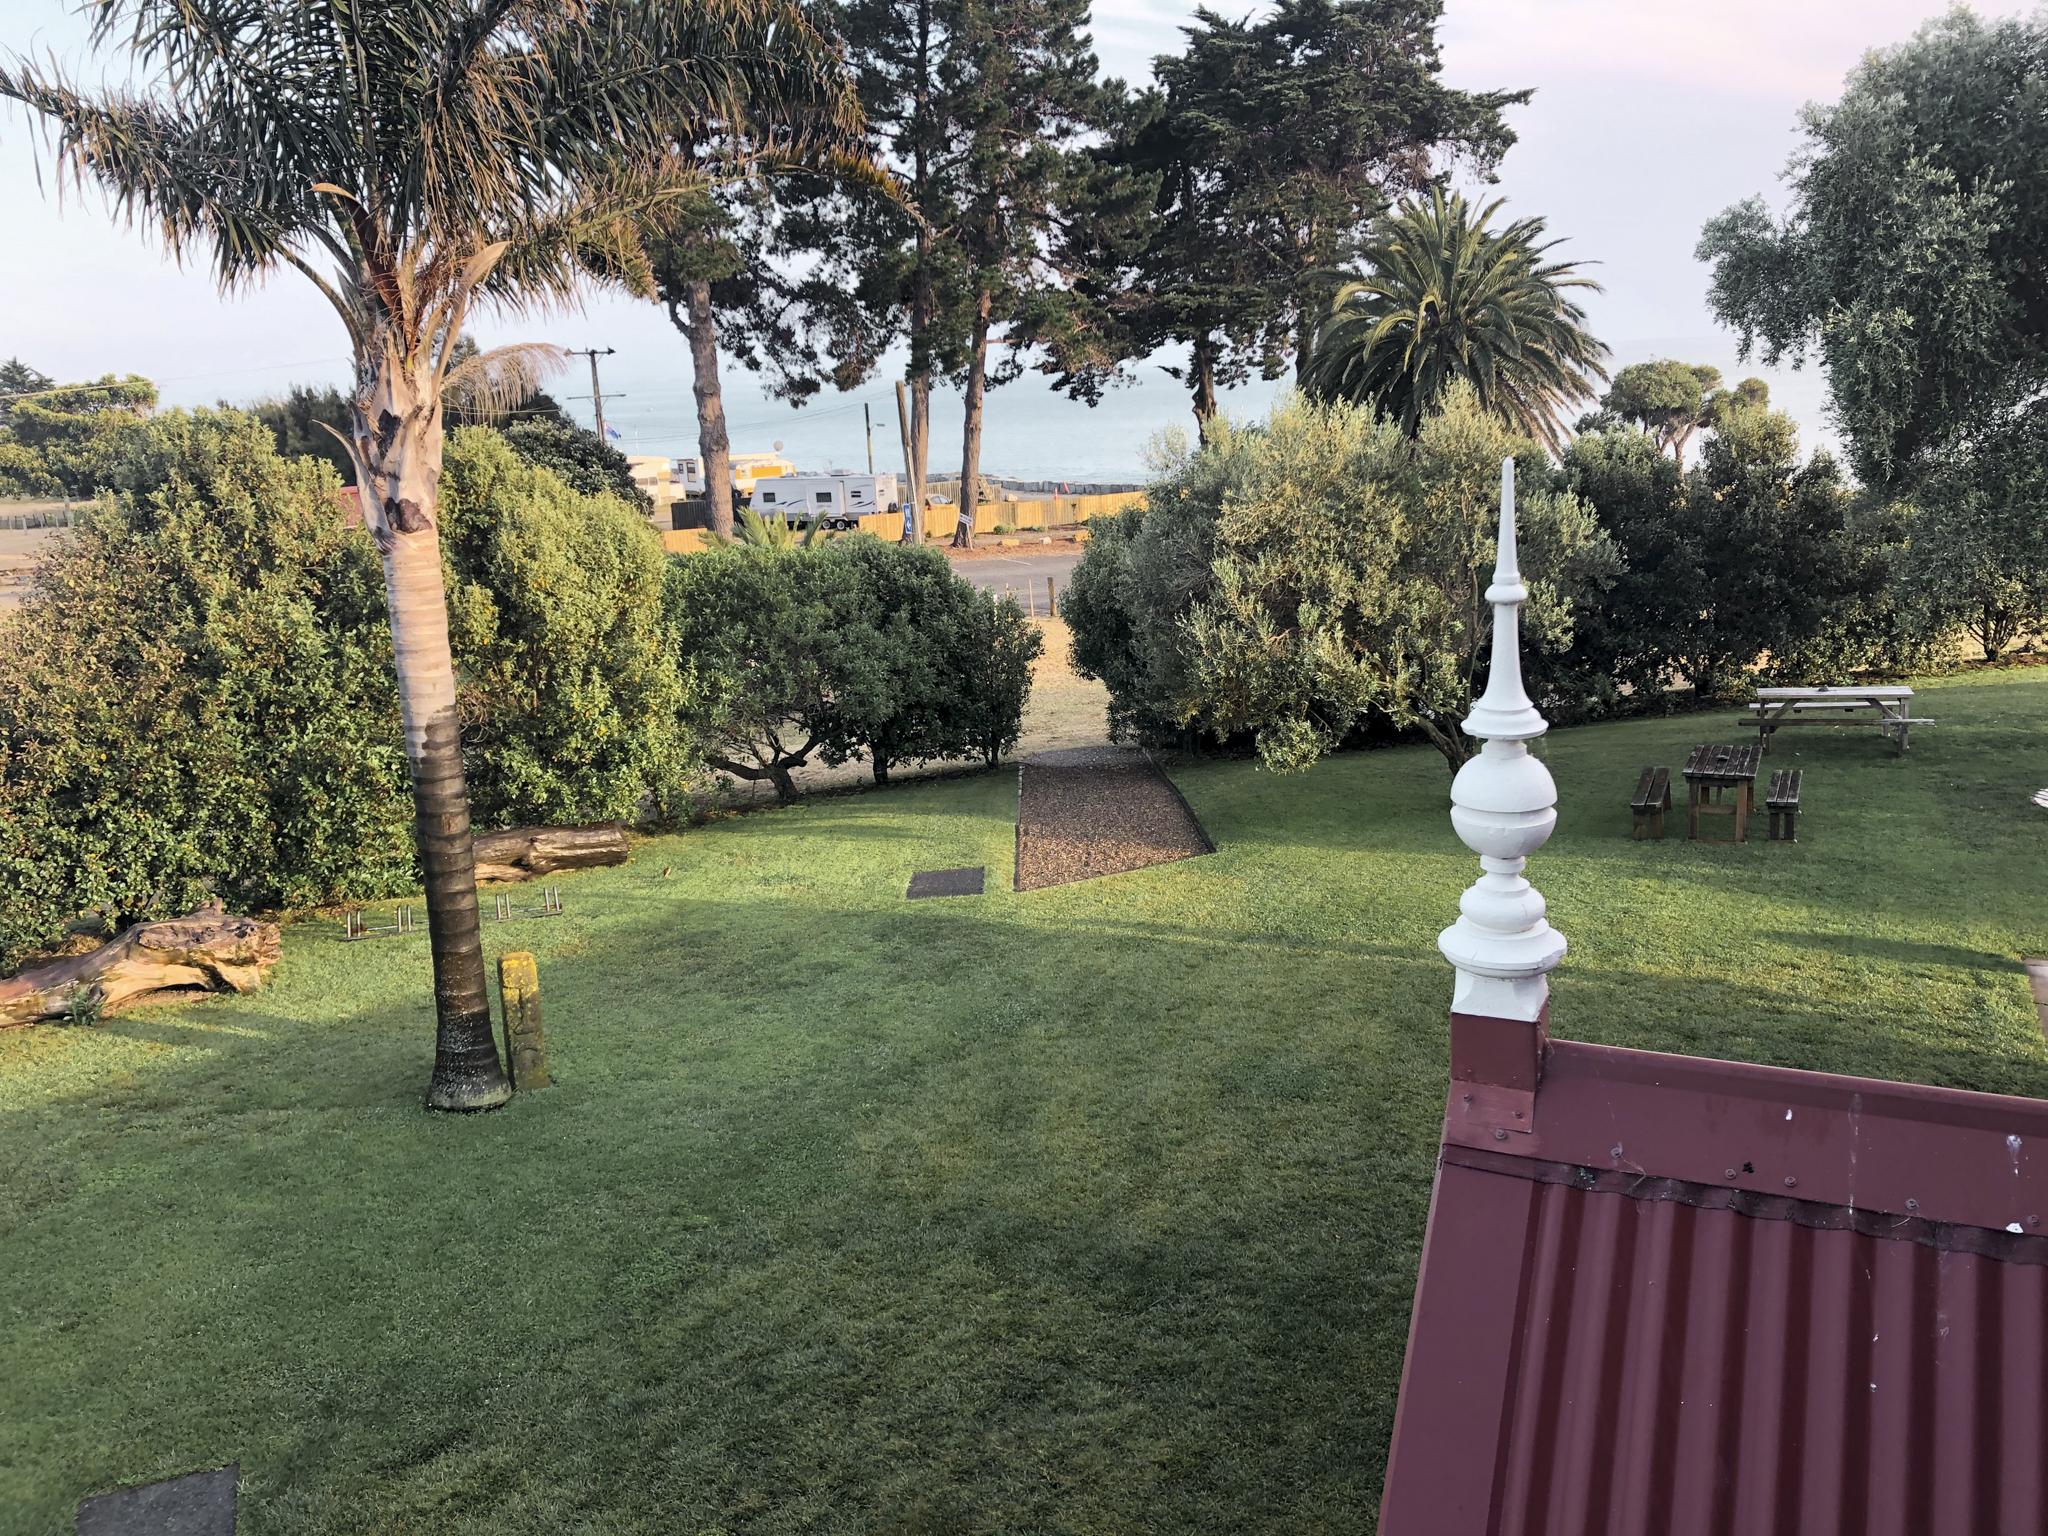 Surrounding palm trees